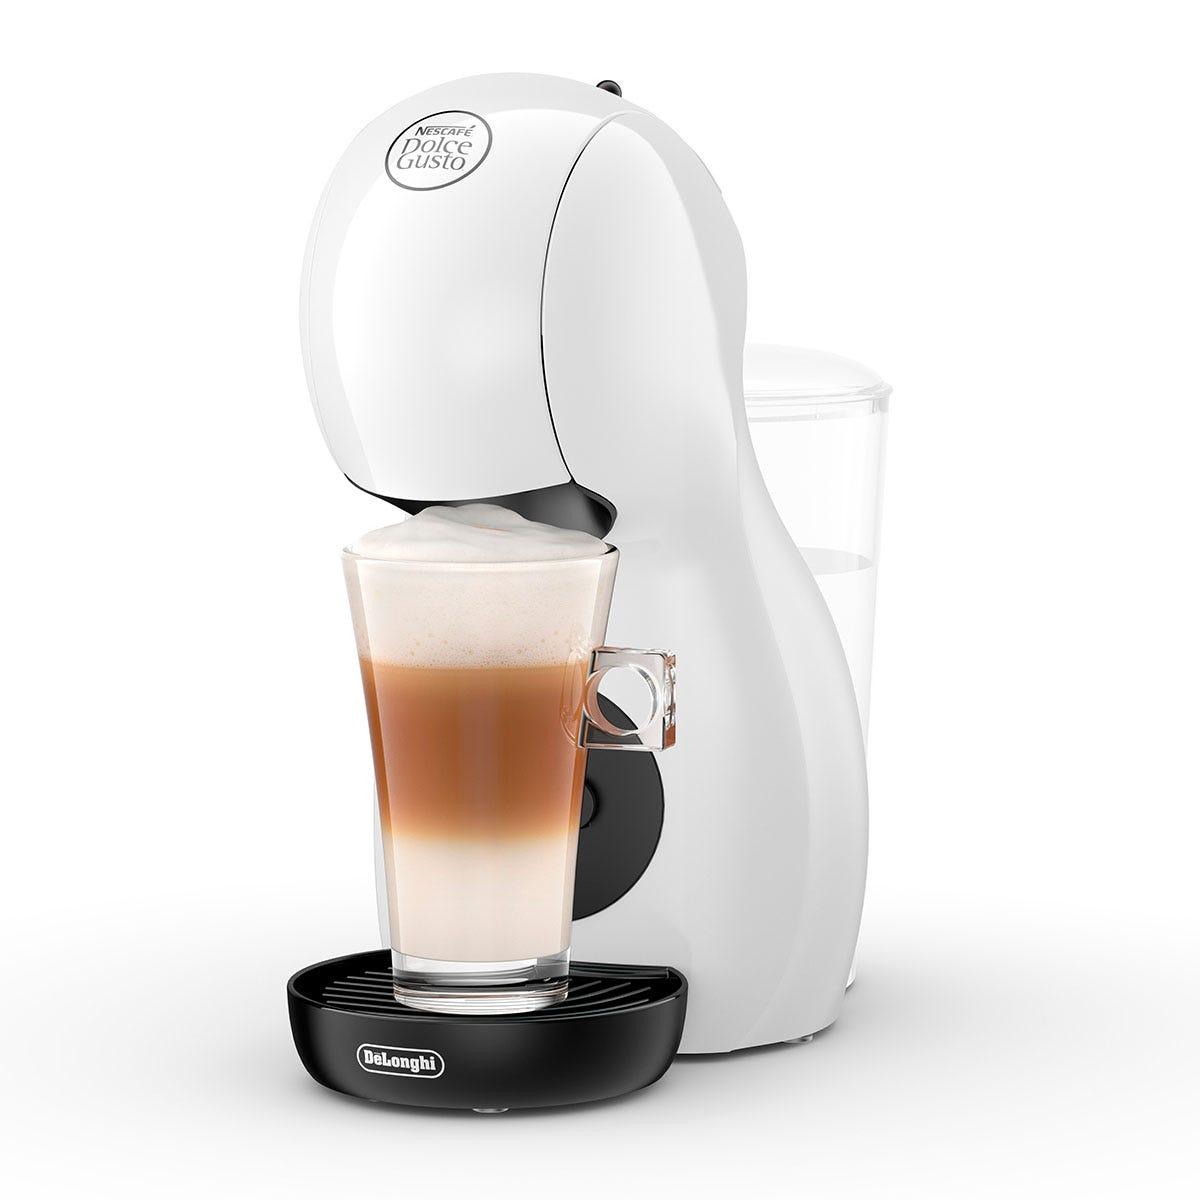 Delonghi EDG110.WB Dolce Gusto Piccolo XS Capsule Coffee Machine - White and Black